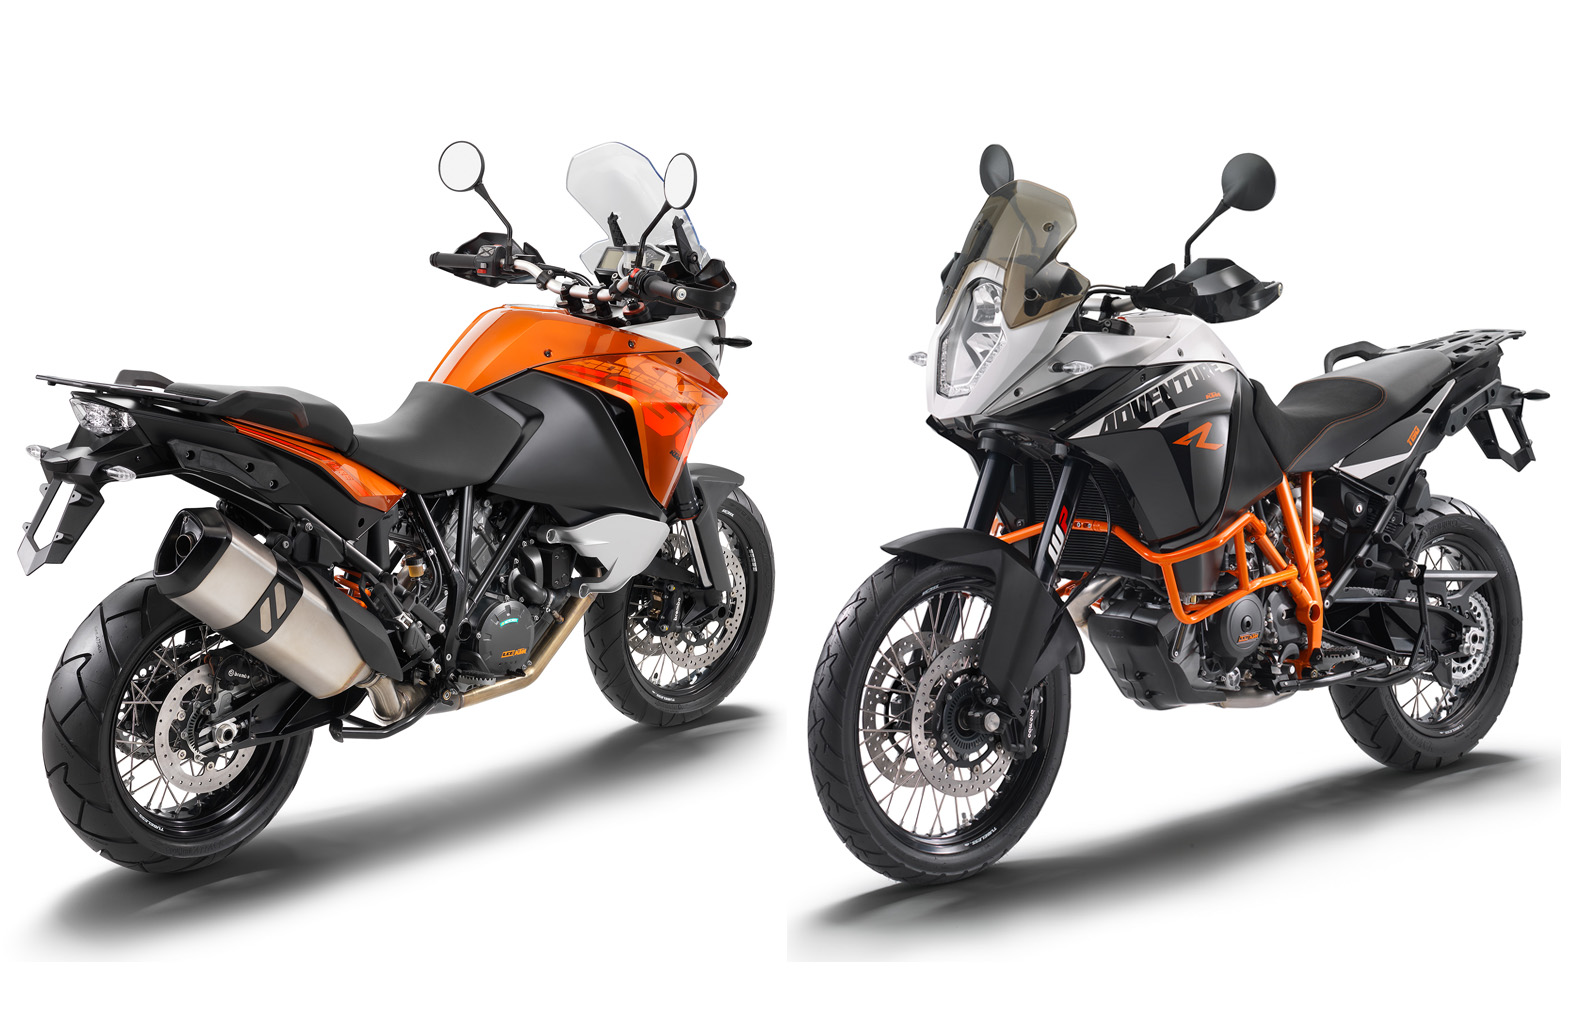 Differences: KTM 1190 Adventure vs. Adventure R